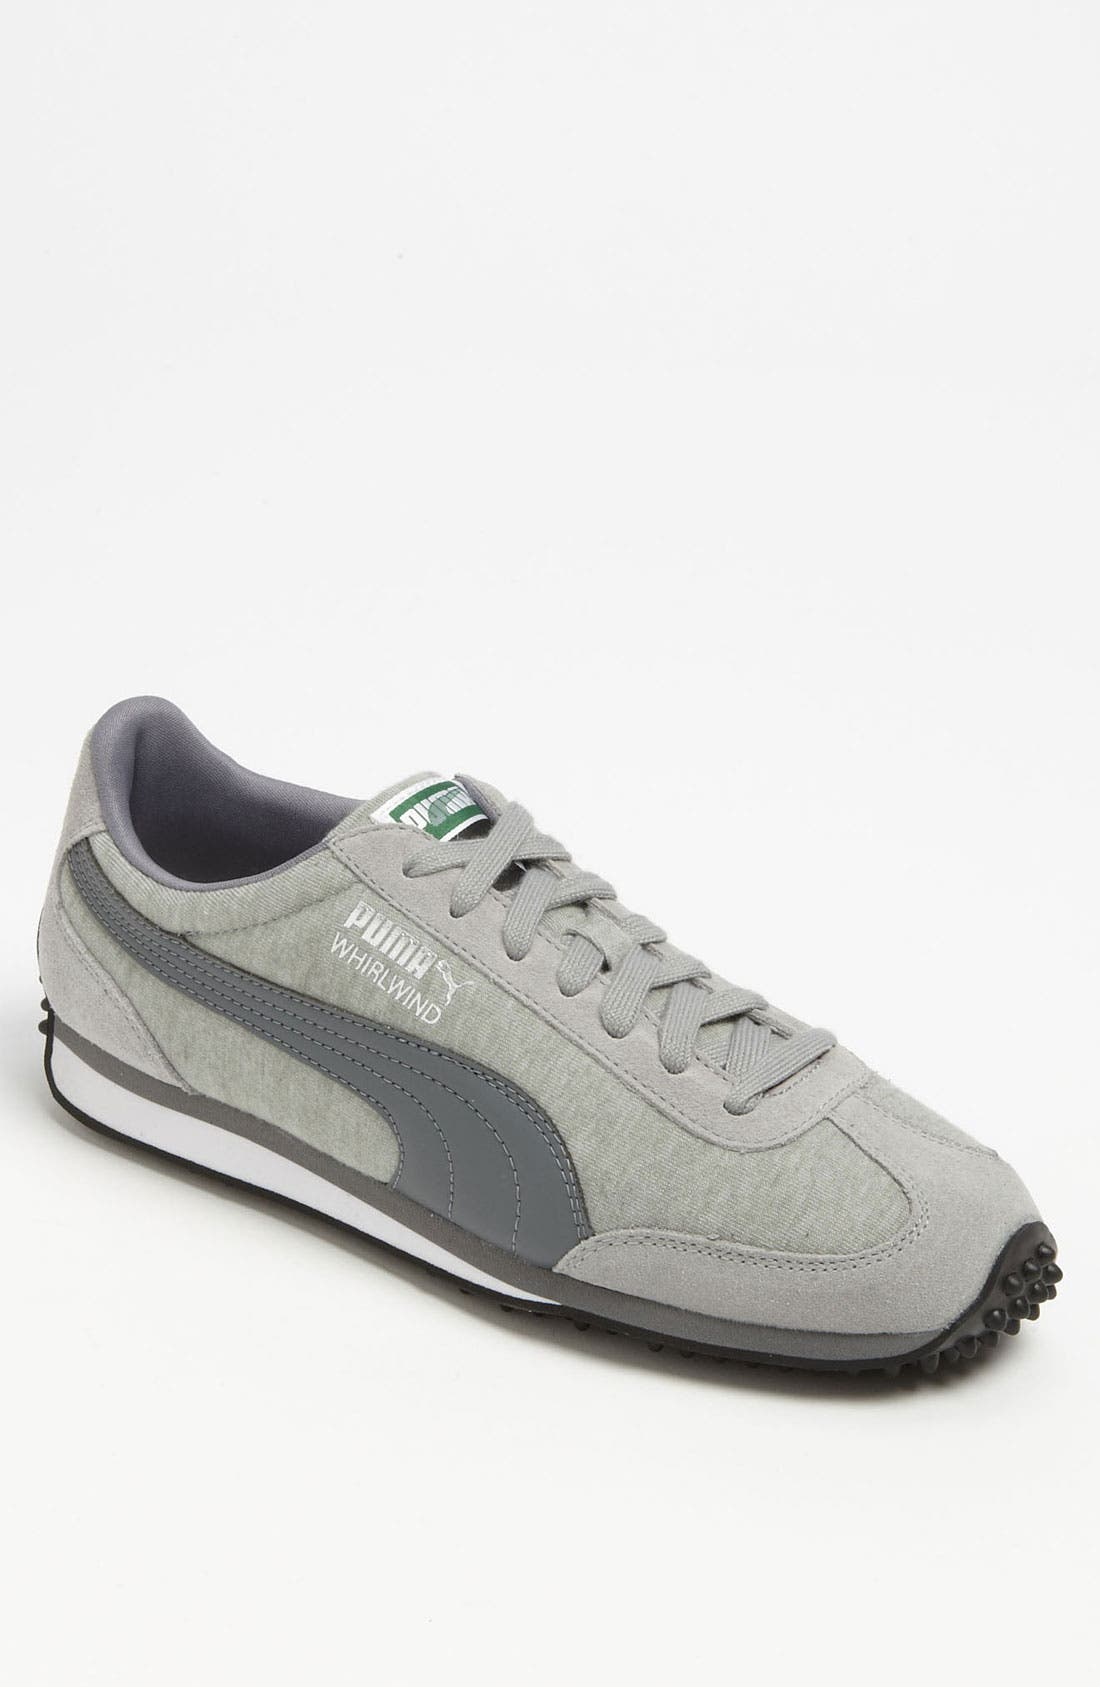 Alternate Image 1 Selected - PUMA 'Whirlwind' Sneaker (Men)